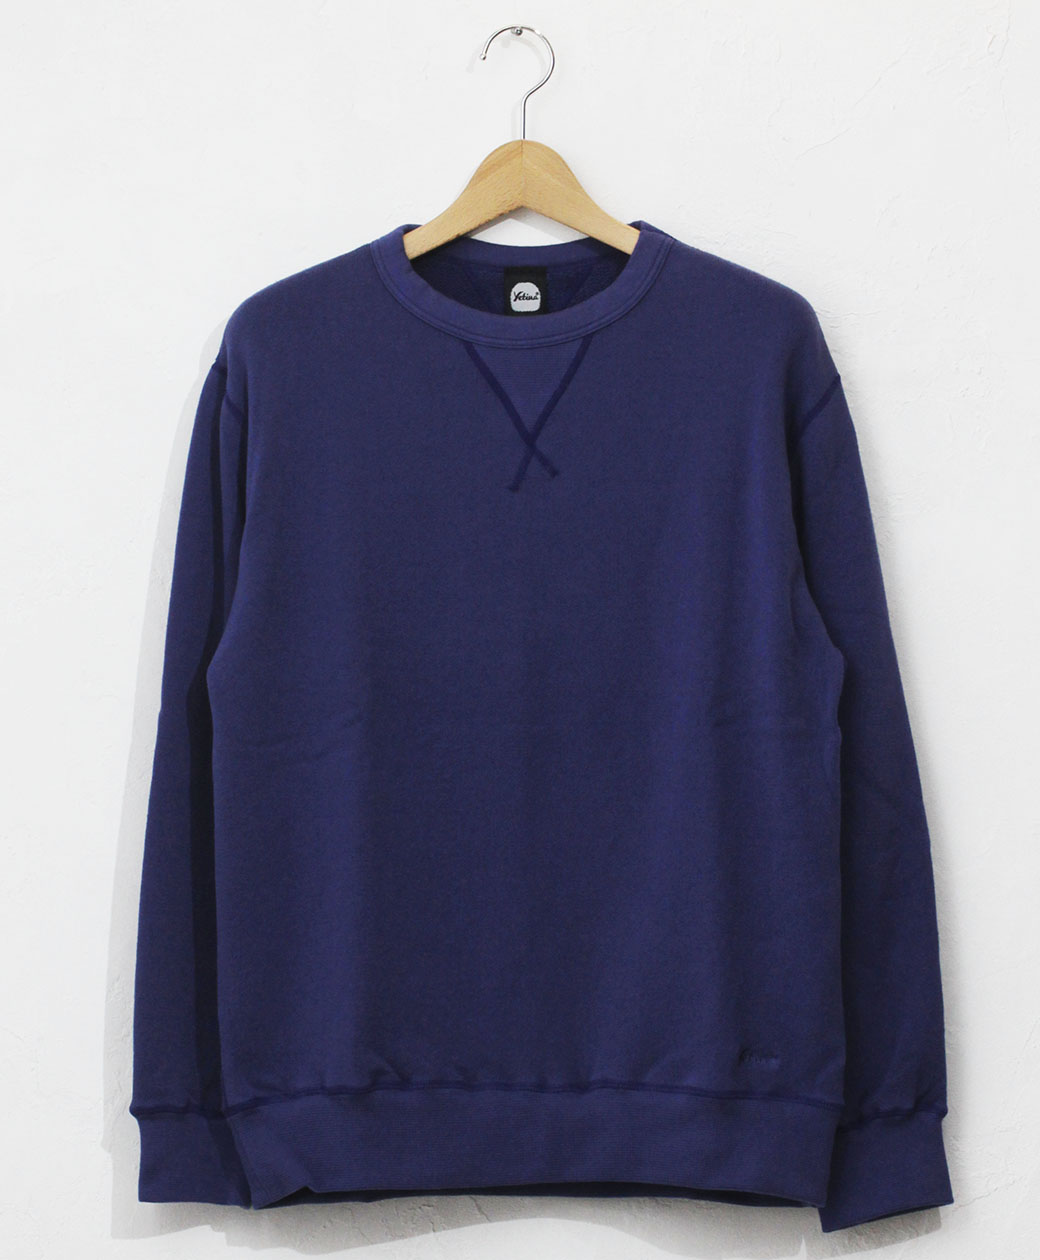 yetina Allseason cotton sweat shirt(cobalt blue)